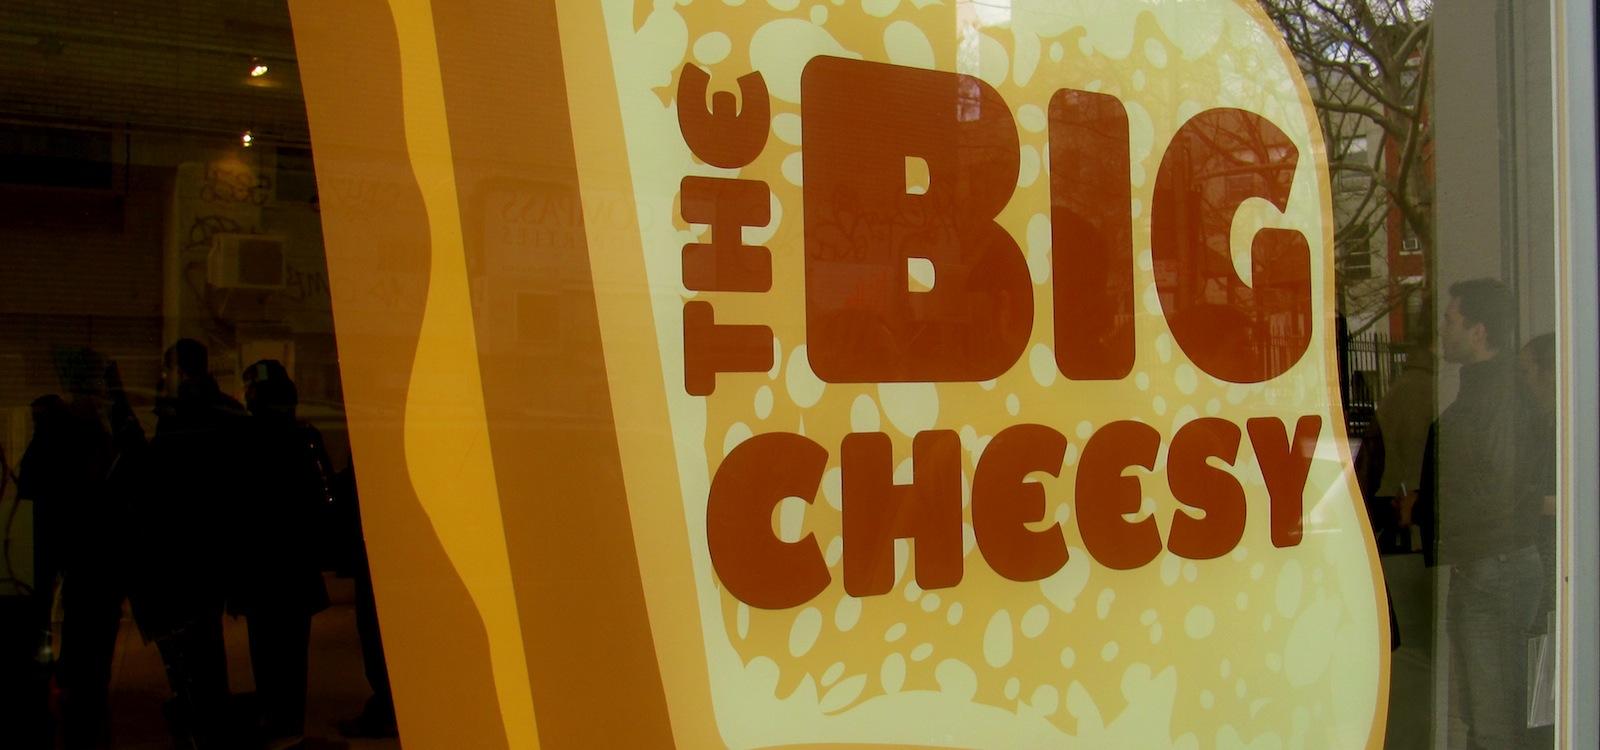 bigcheesy